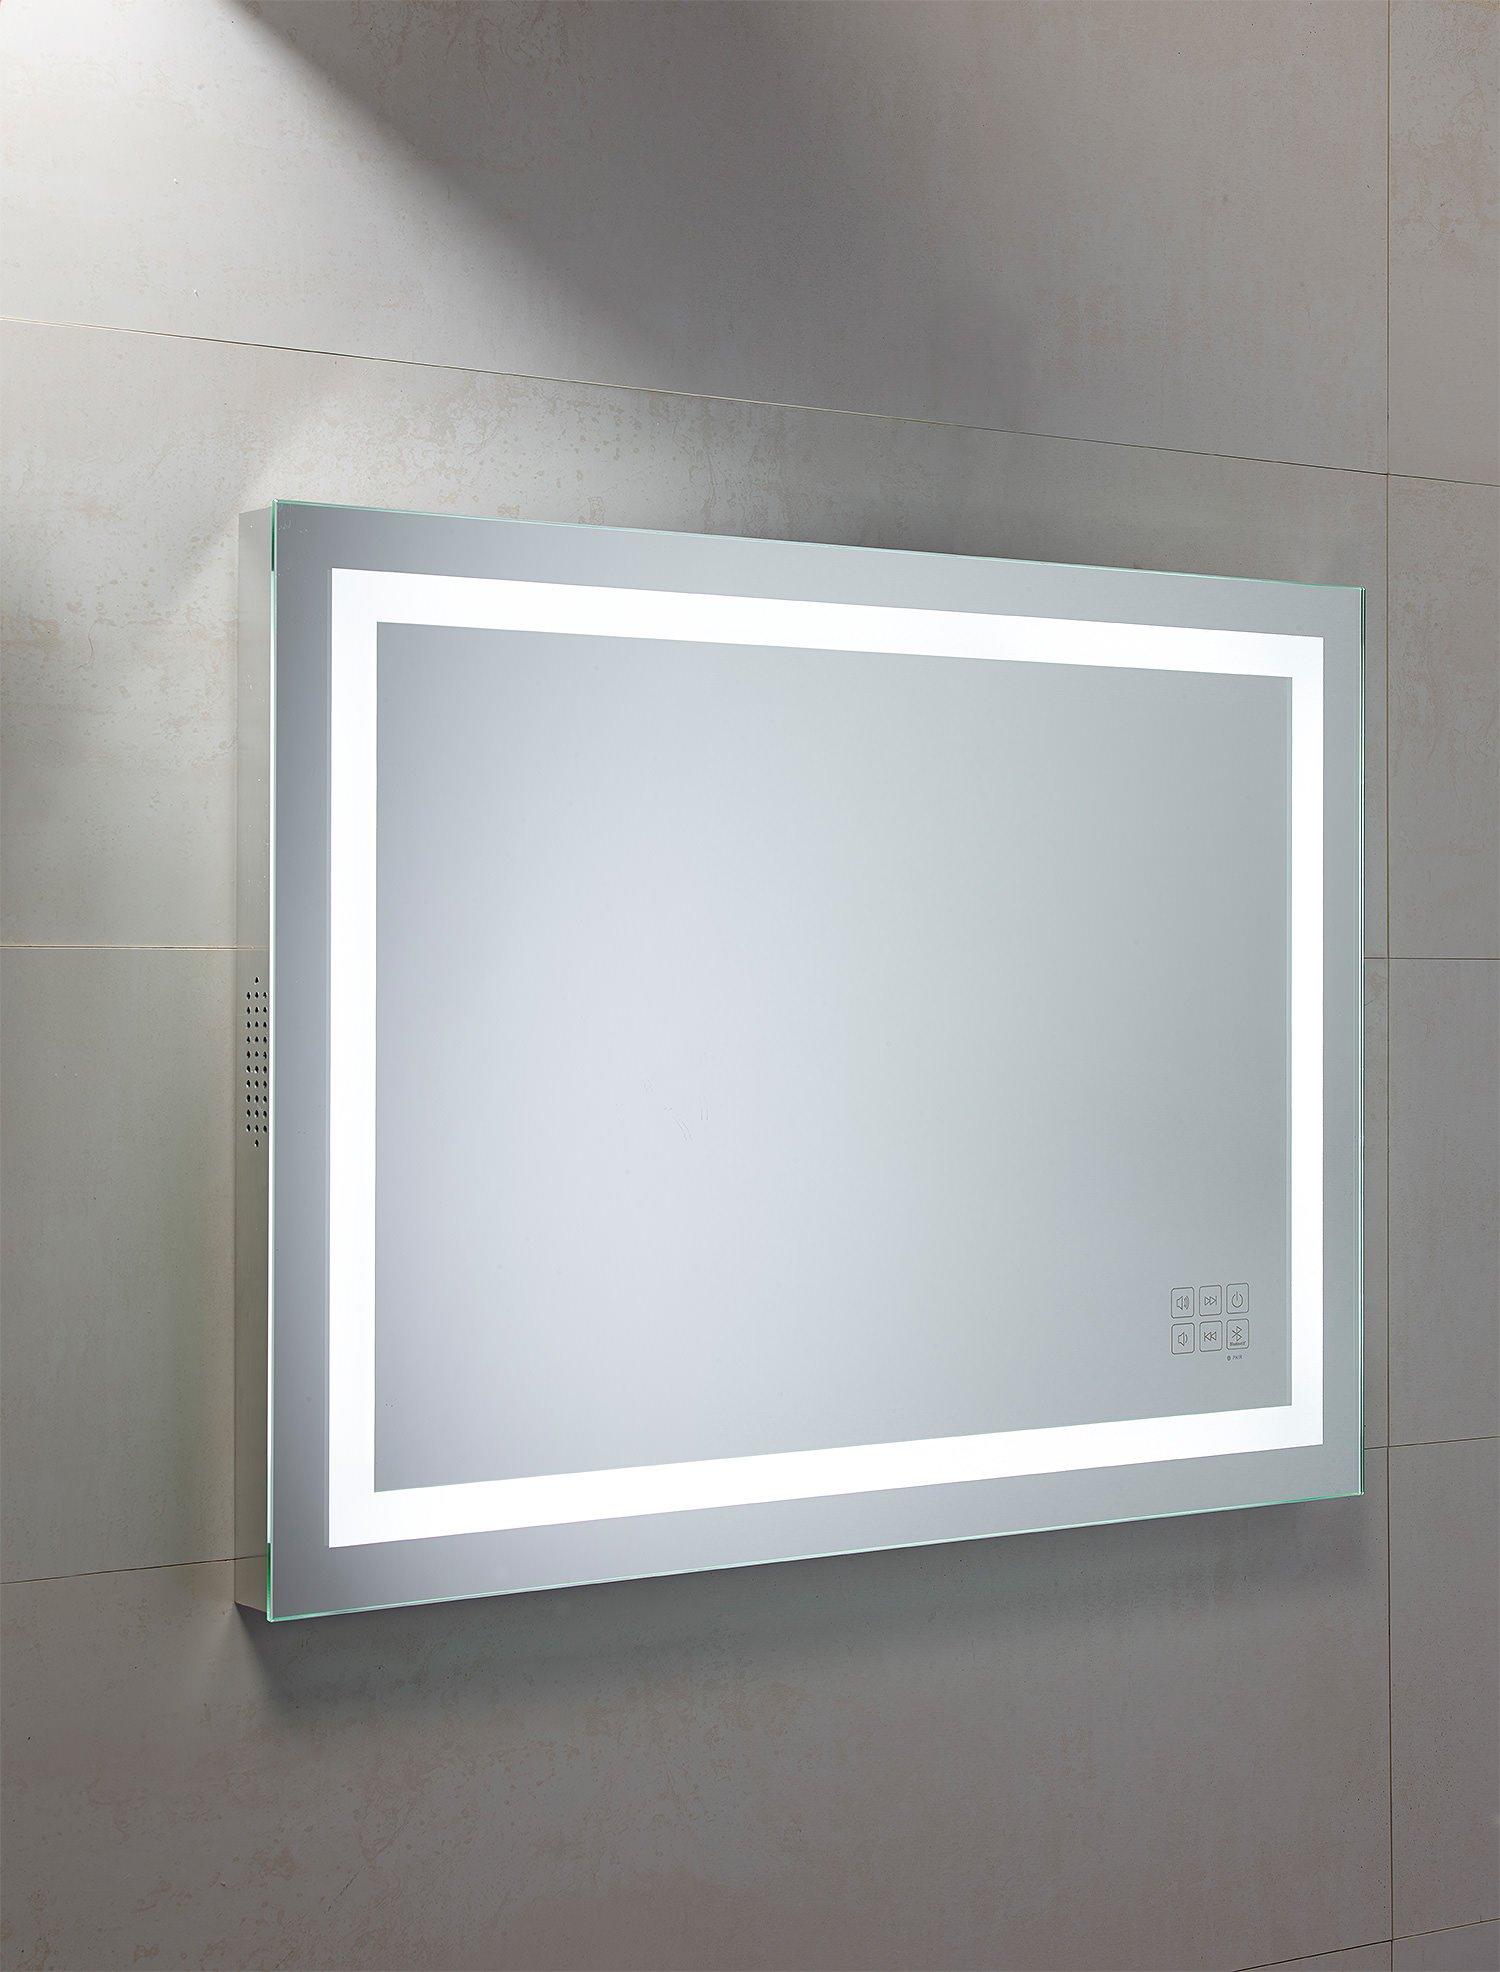 Roper Rhodes Beat 800mm Illuminated Bluetooth Mirror